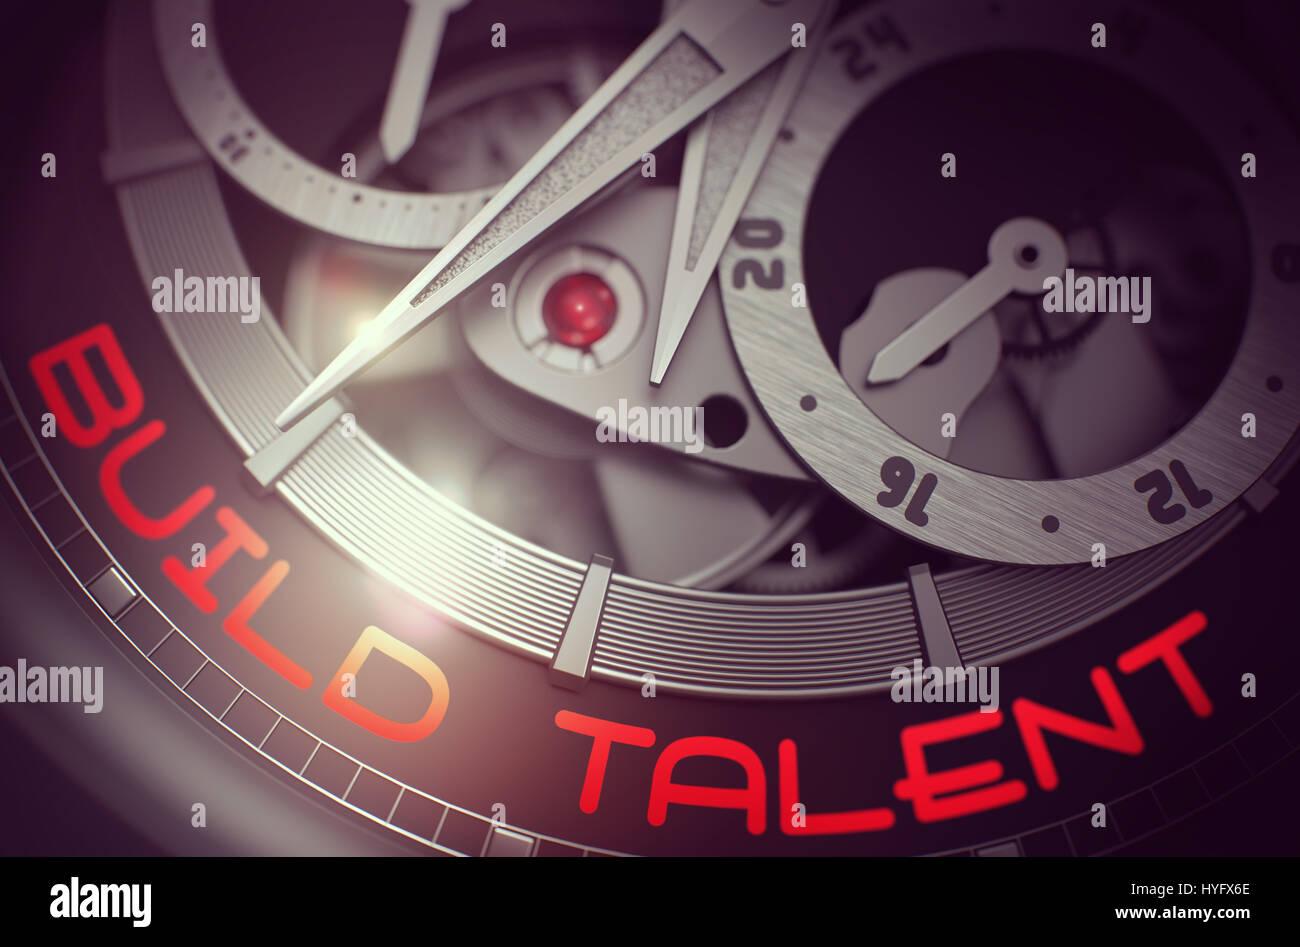 Build Talent on the Fashion Wrist Watch Mechanism. 3D. Stock Photo